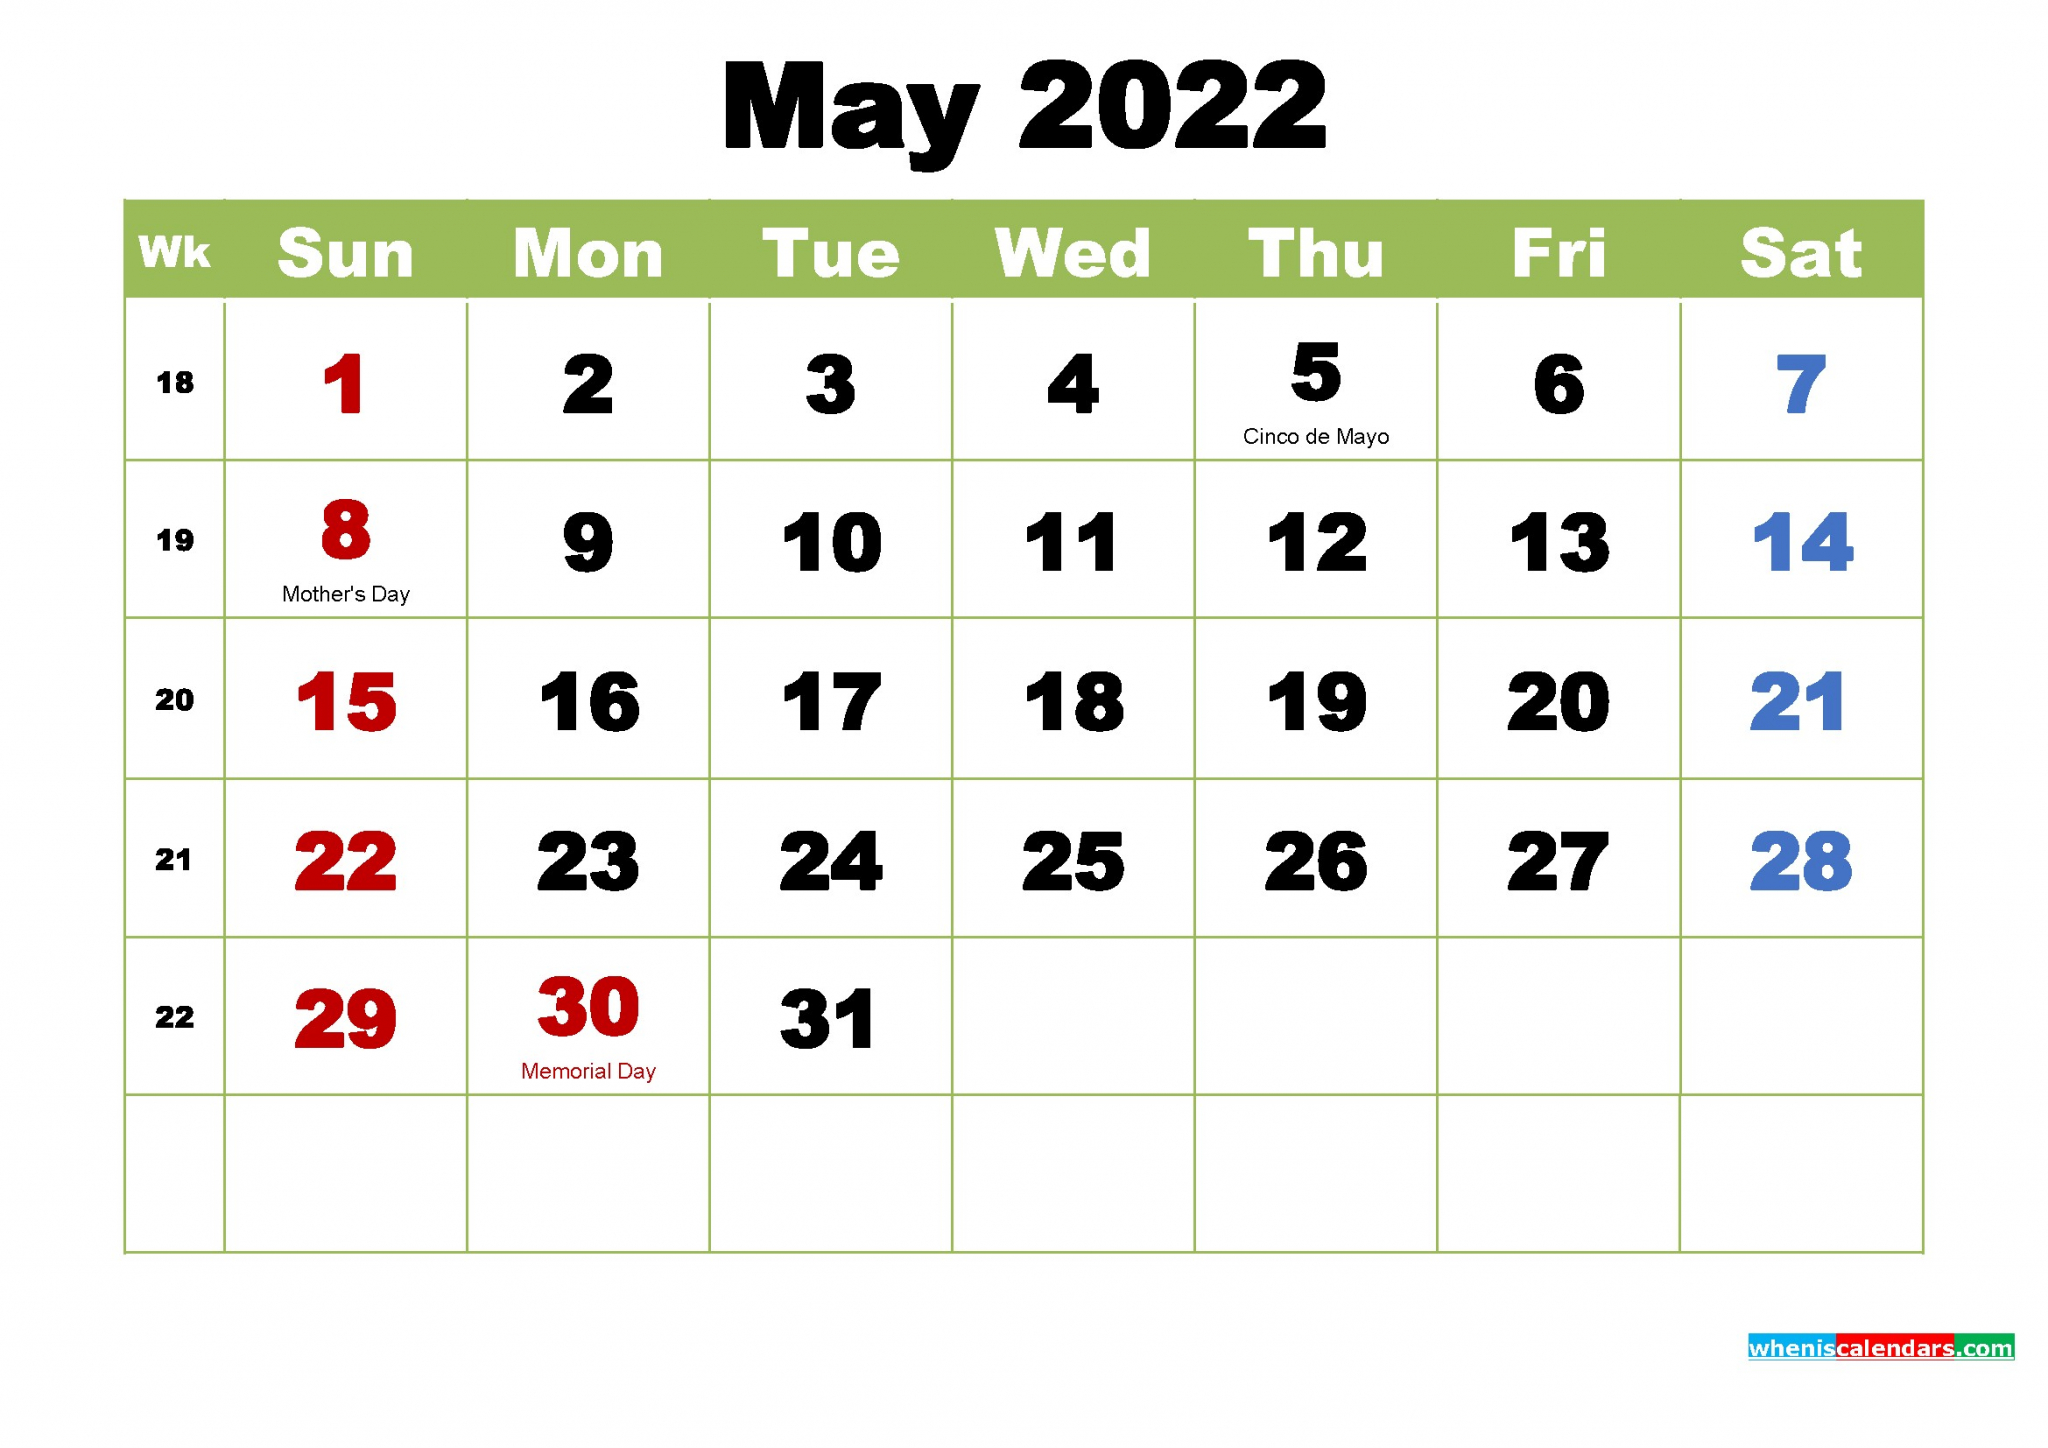 May 2022 Calendar Printable | Free Printable Calendar Monthly regarding May 2022 Calendar Printable Photo